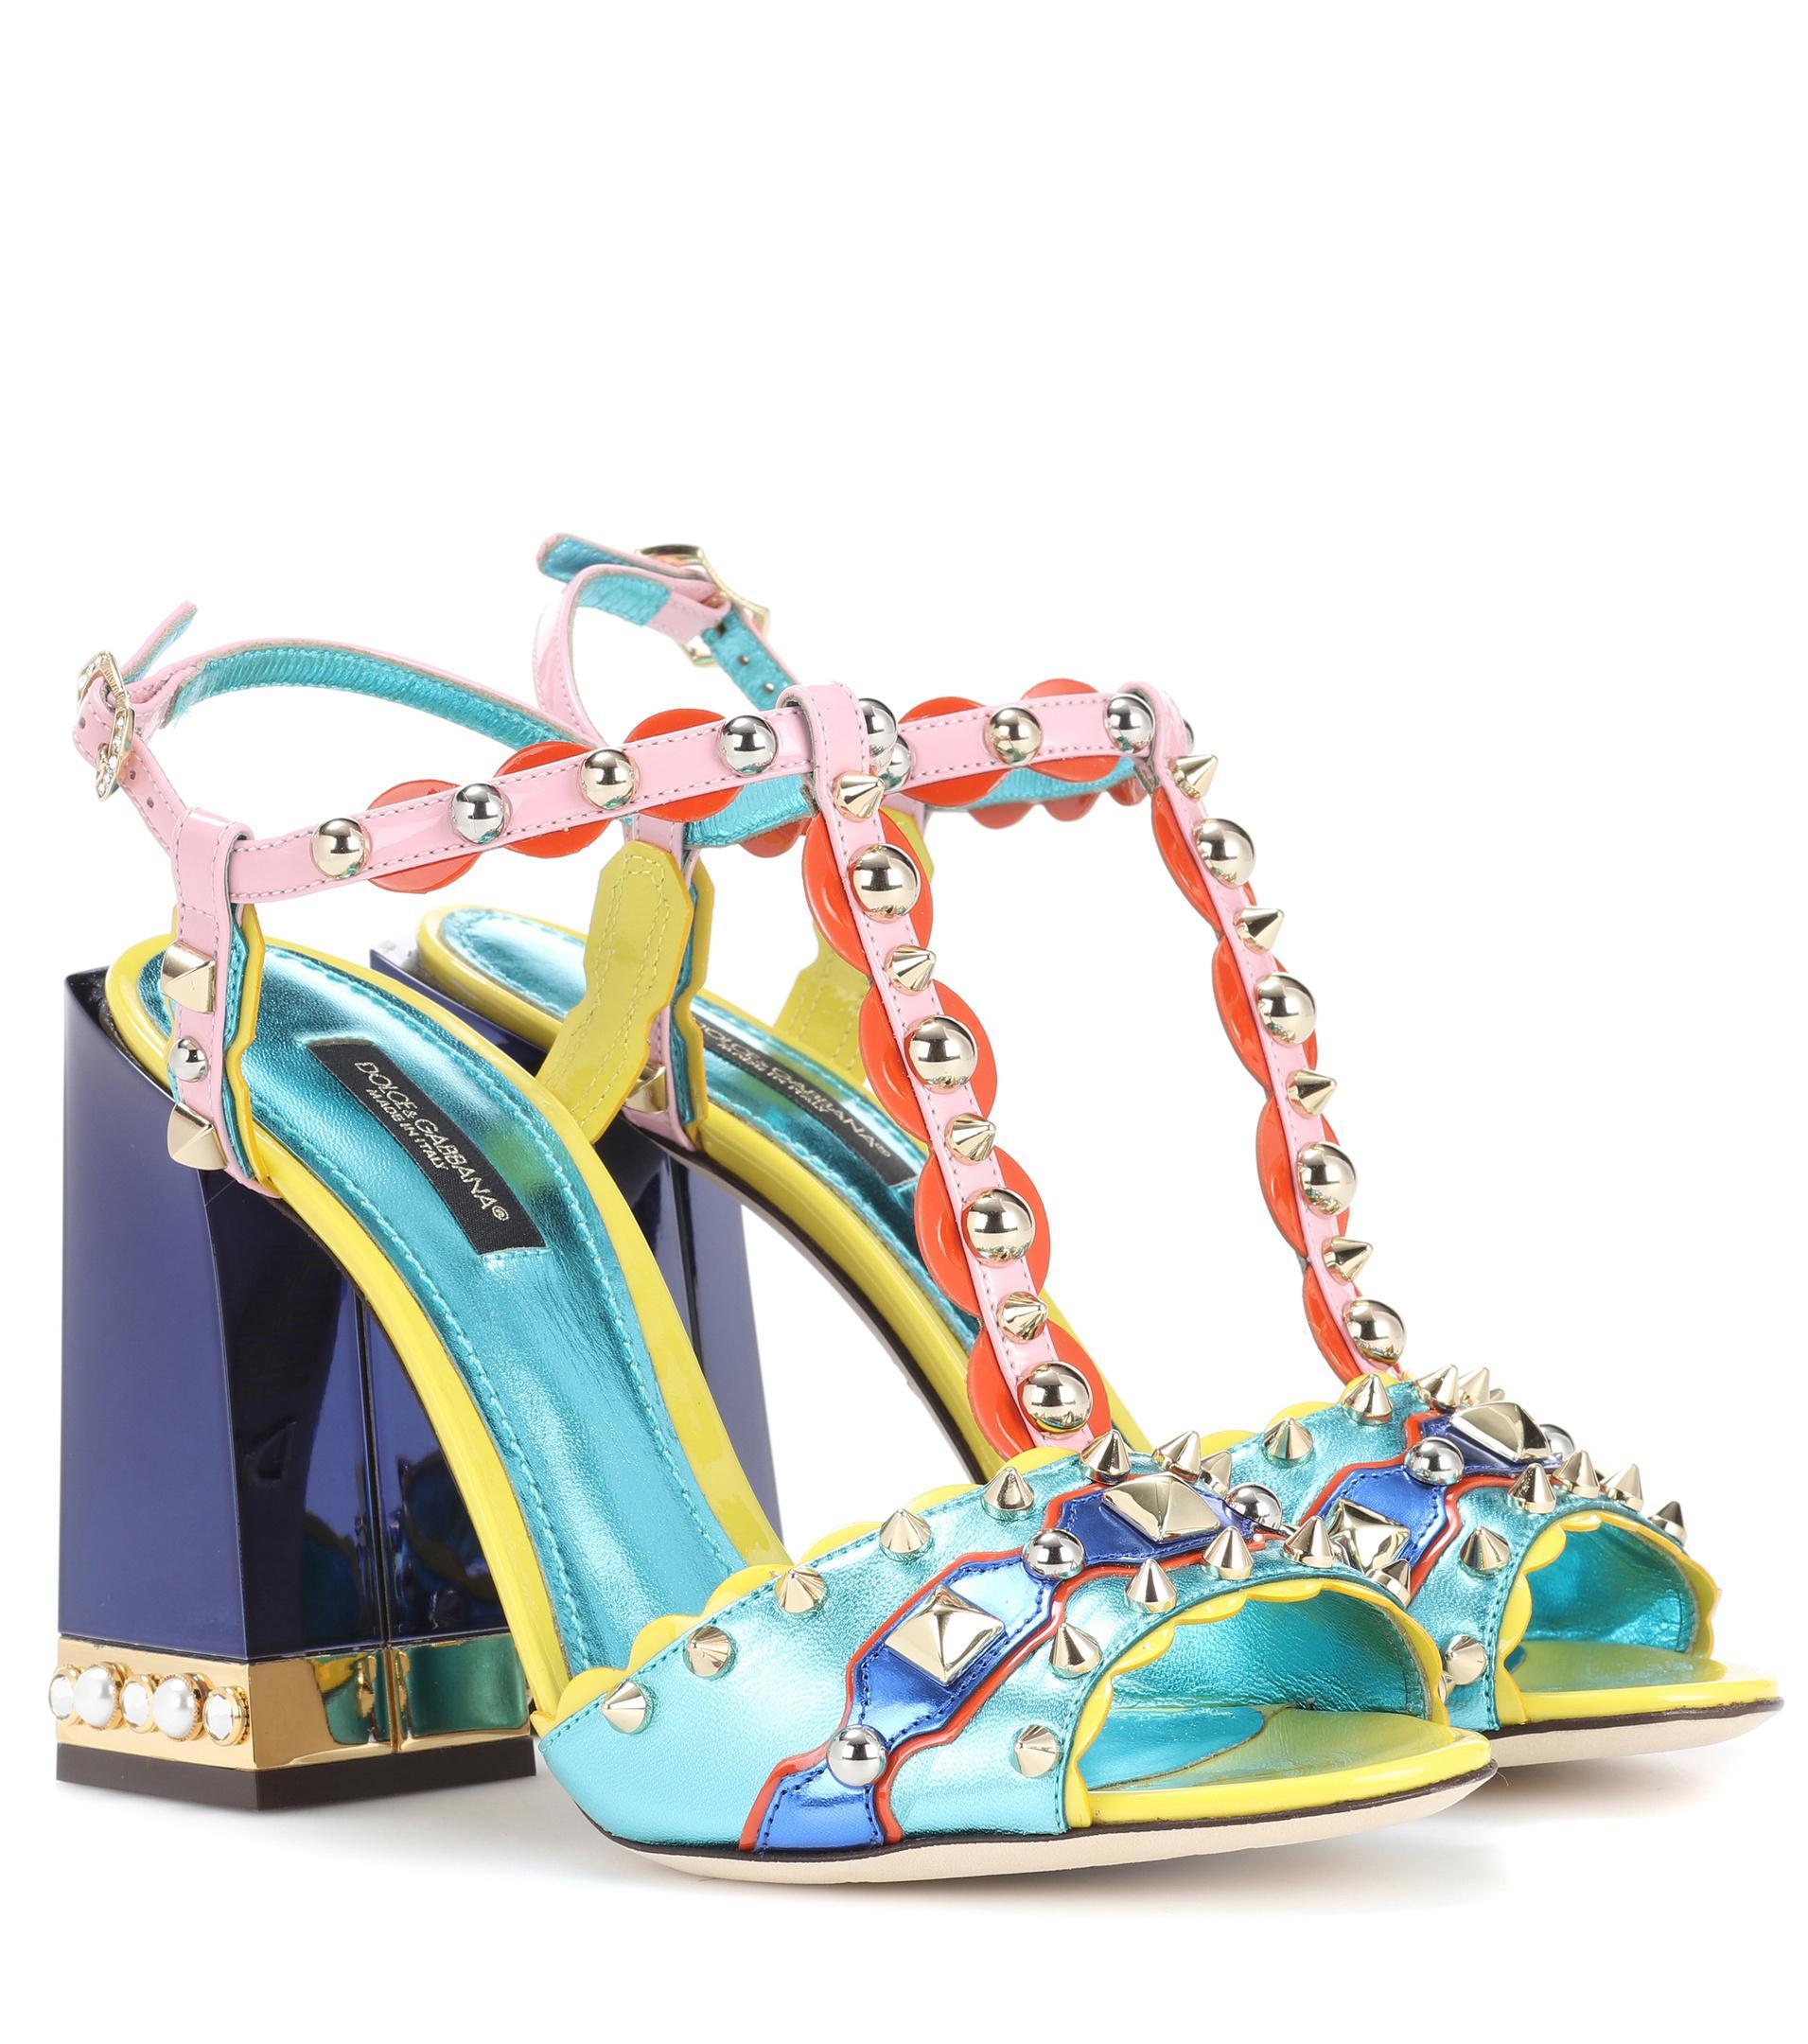 ead0b480529 dolce-gabbana-multicoloured-Embellished-Leather-Sandals.jpeg